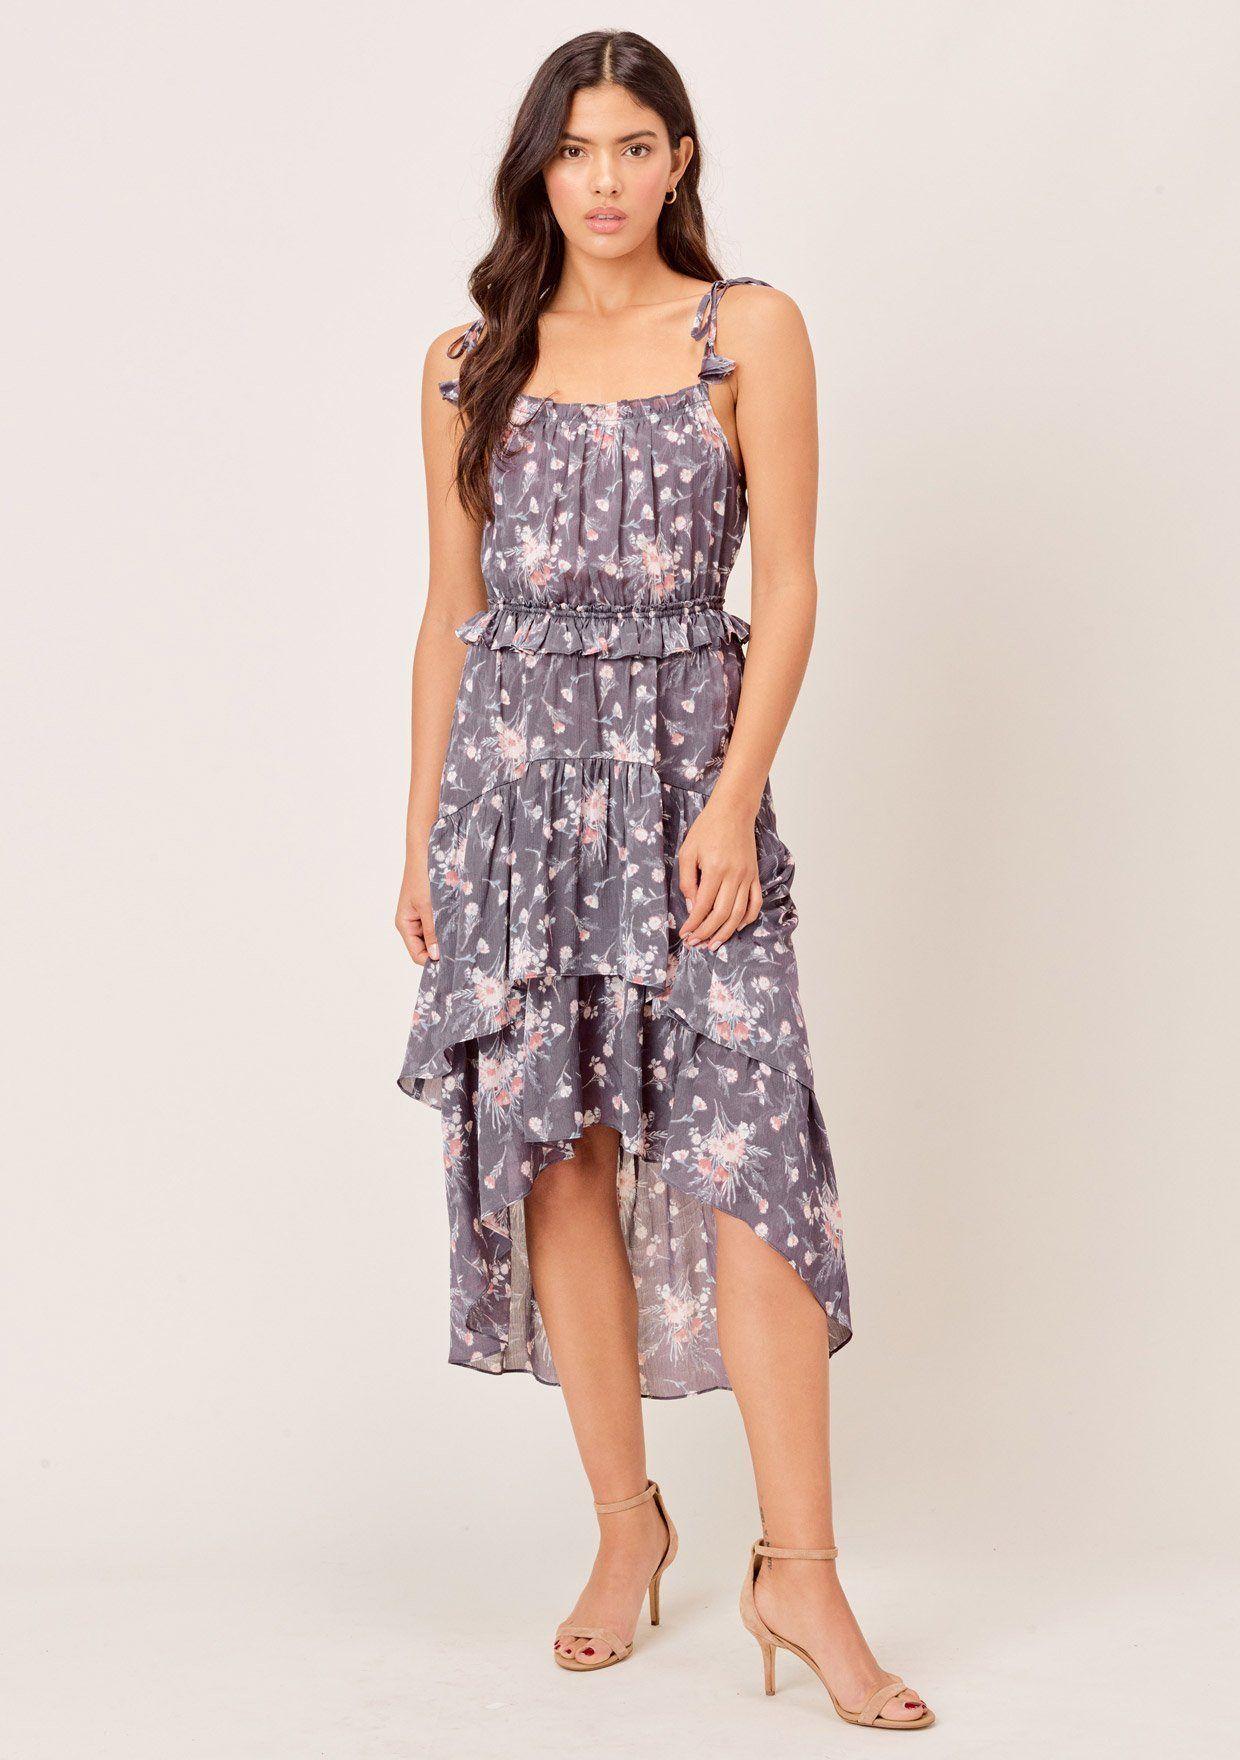 Nieva Floral Tie Strap Midi Dress Lovestitch Midi Dress Dresses Tank Top Midi Dress [ 1760 x 1240 Pixel ]